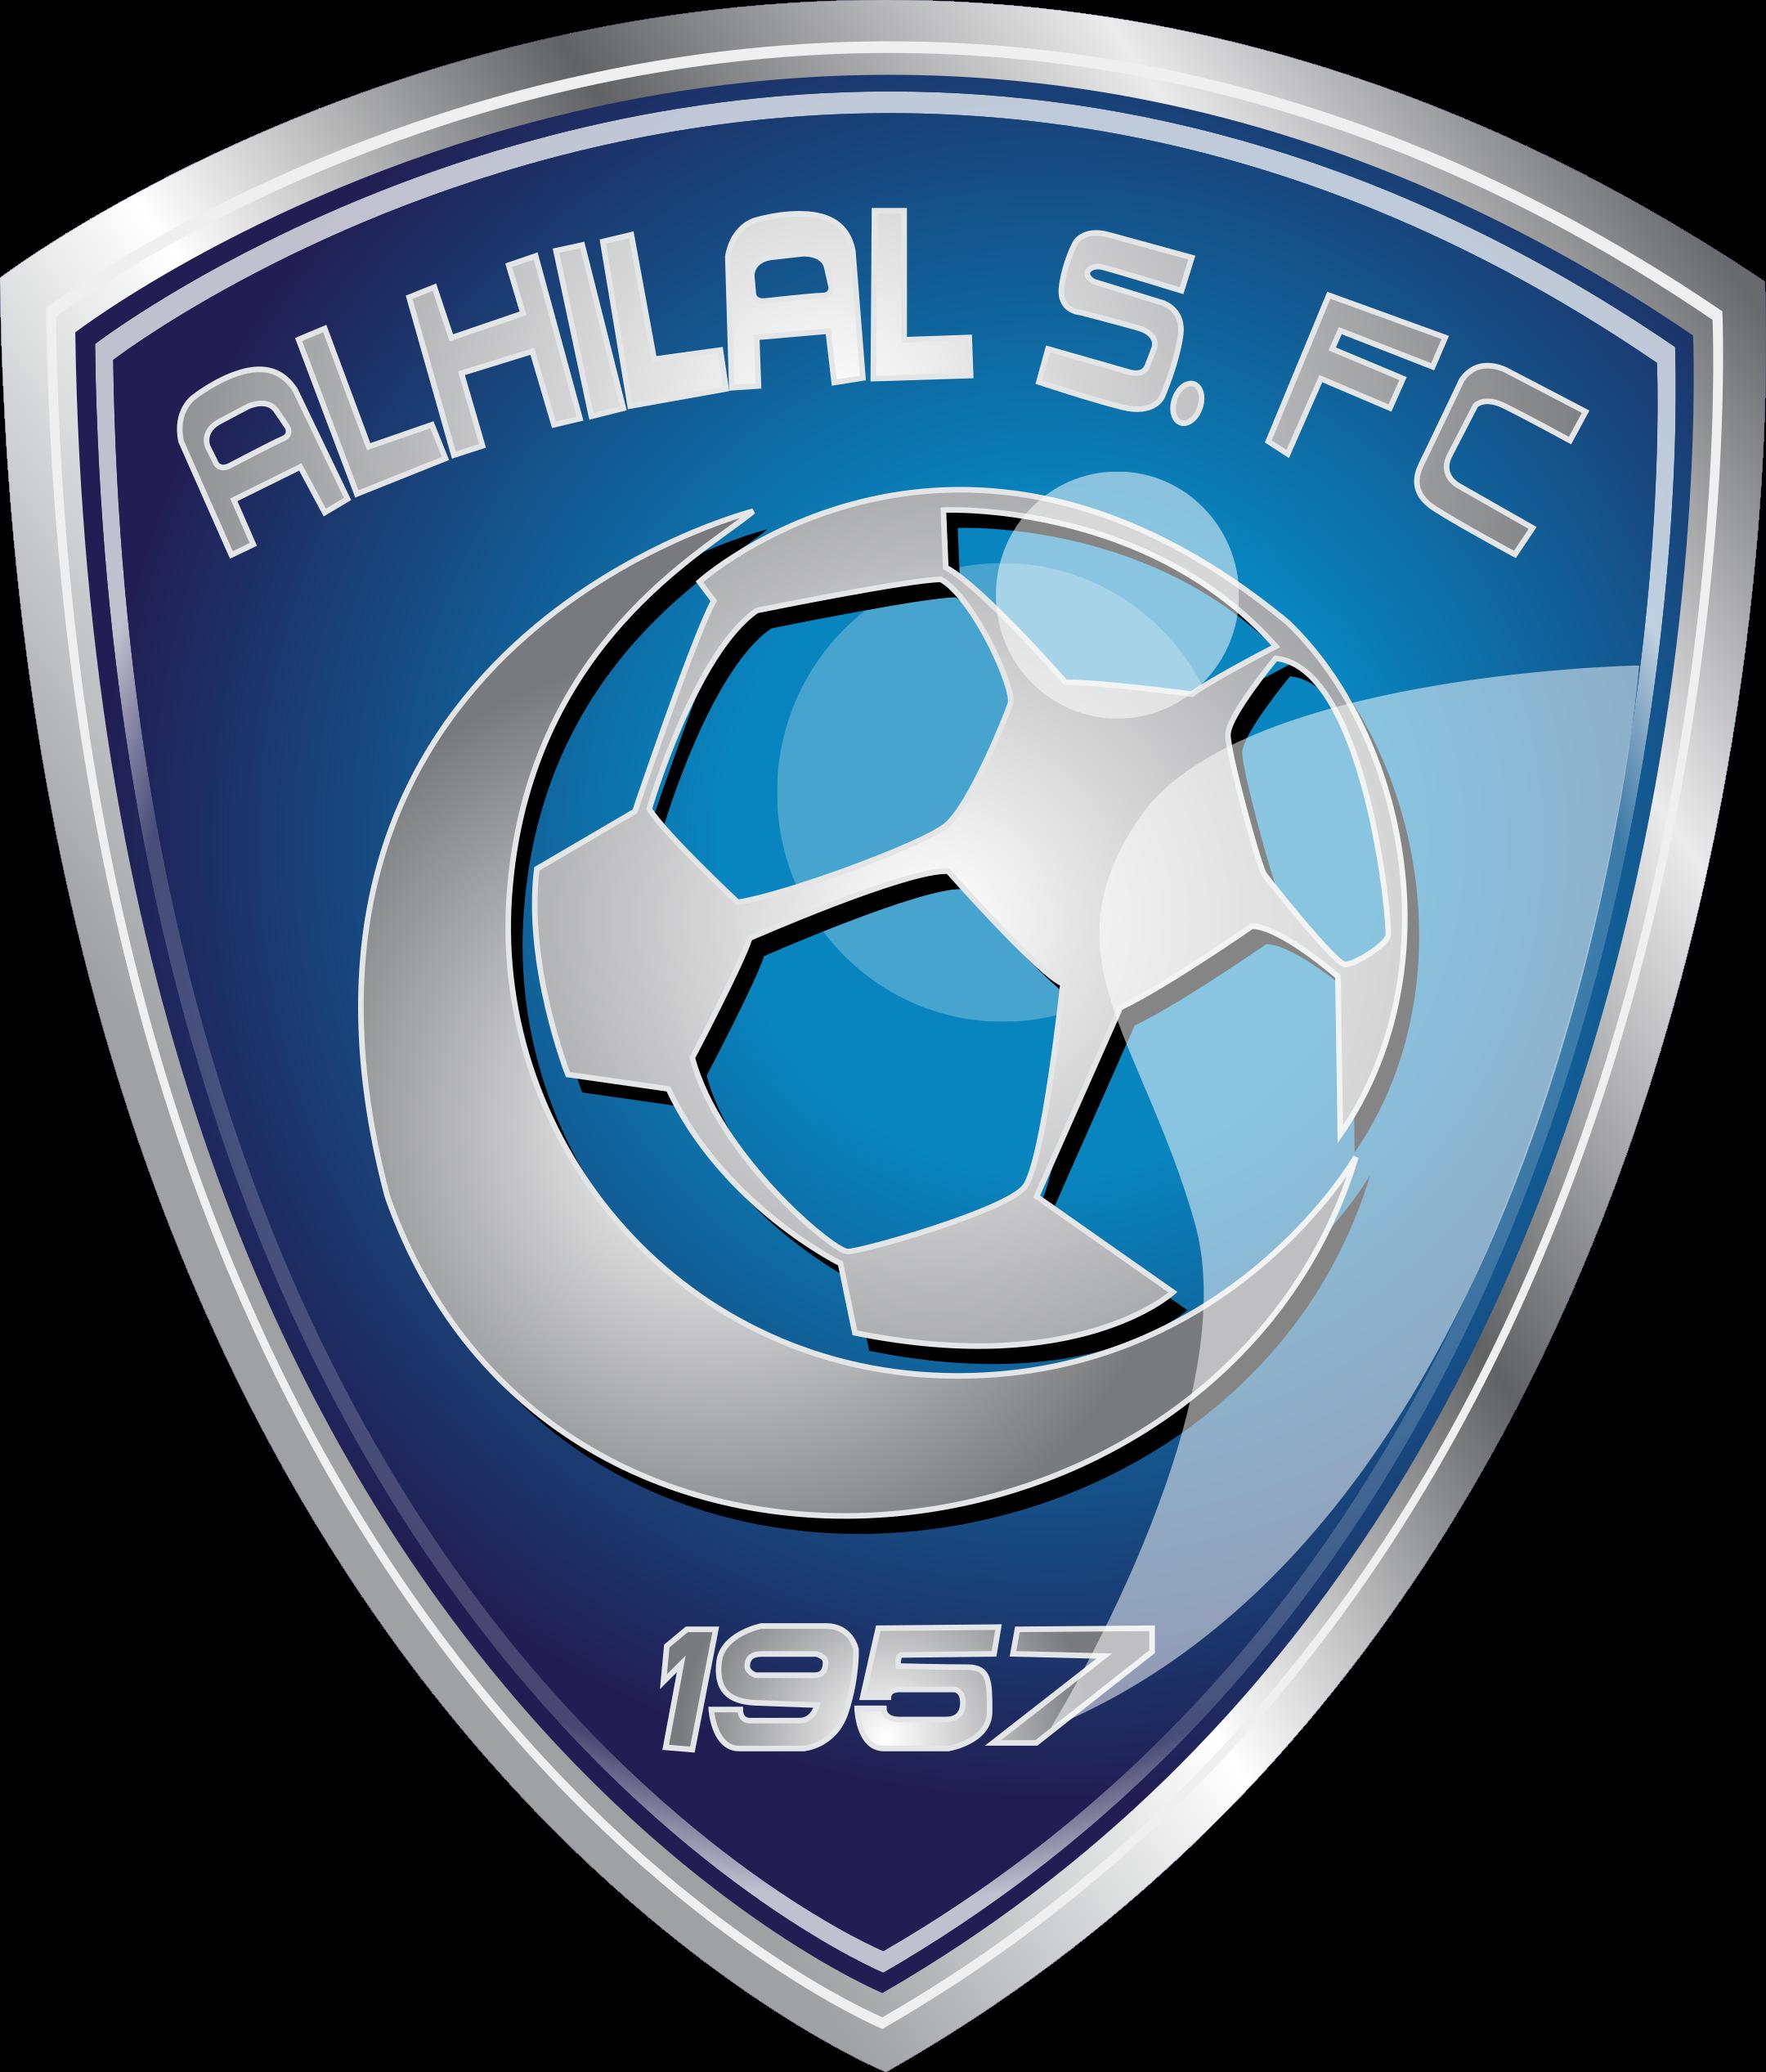 al hilal fc logo 1 - Al-Hilal SFC Logo